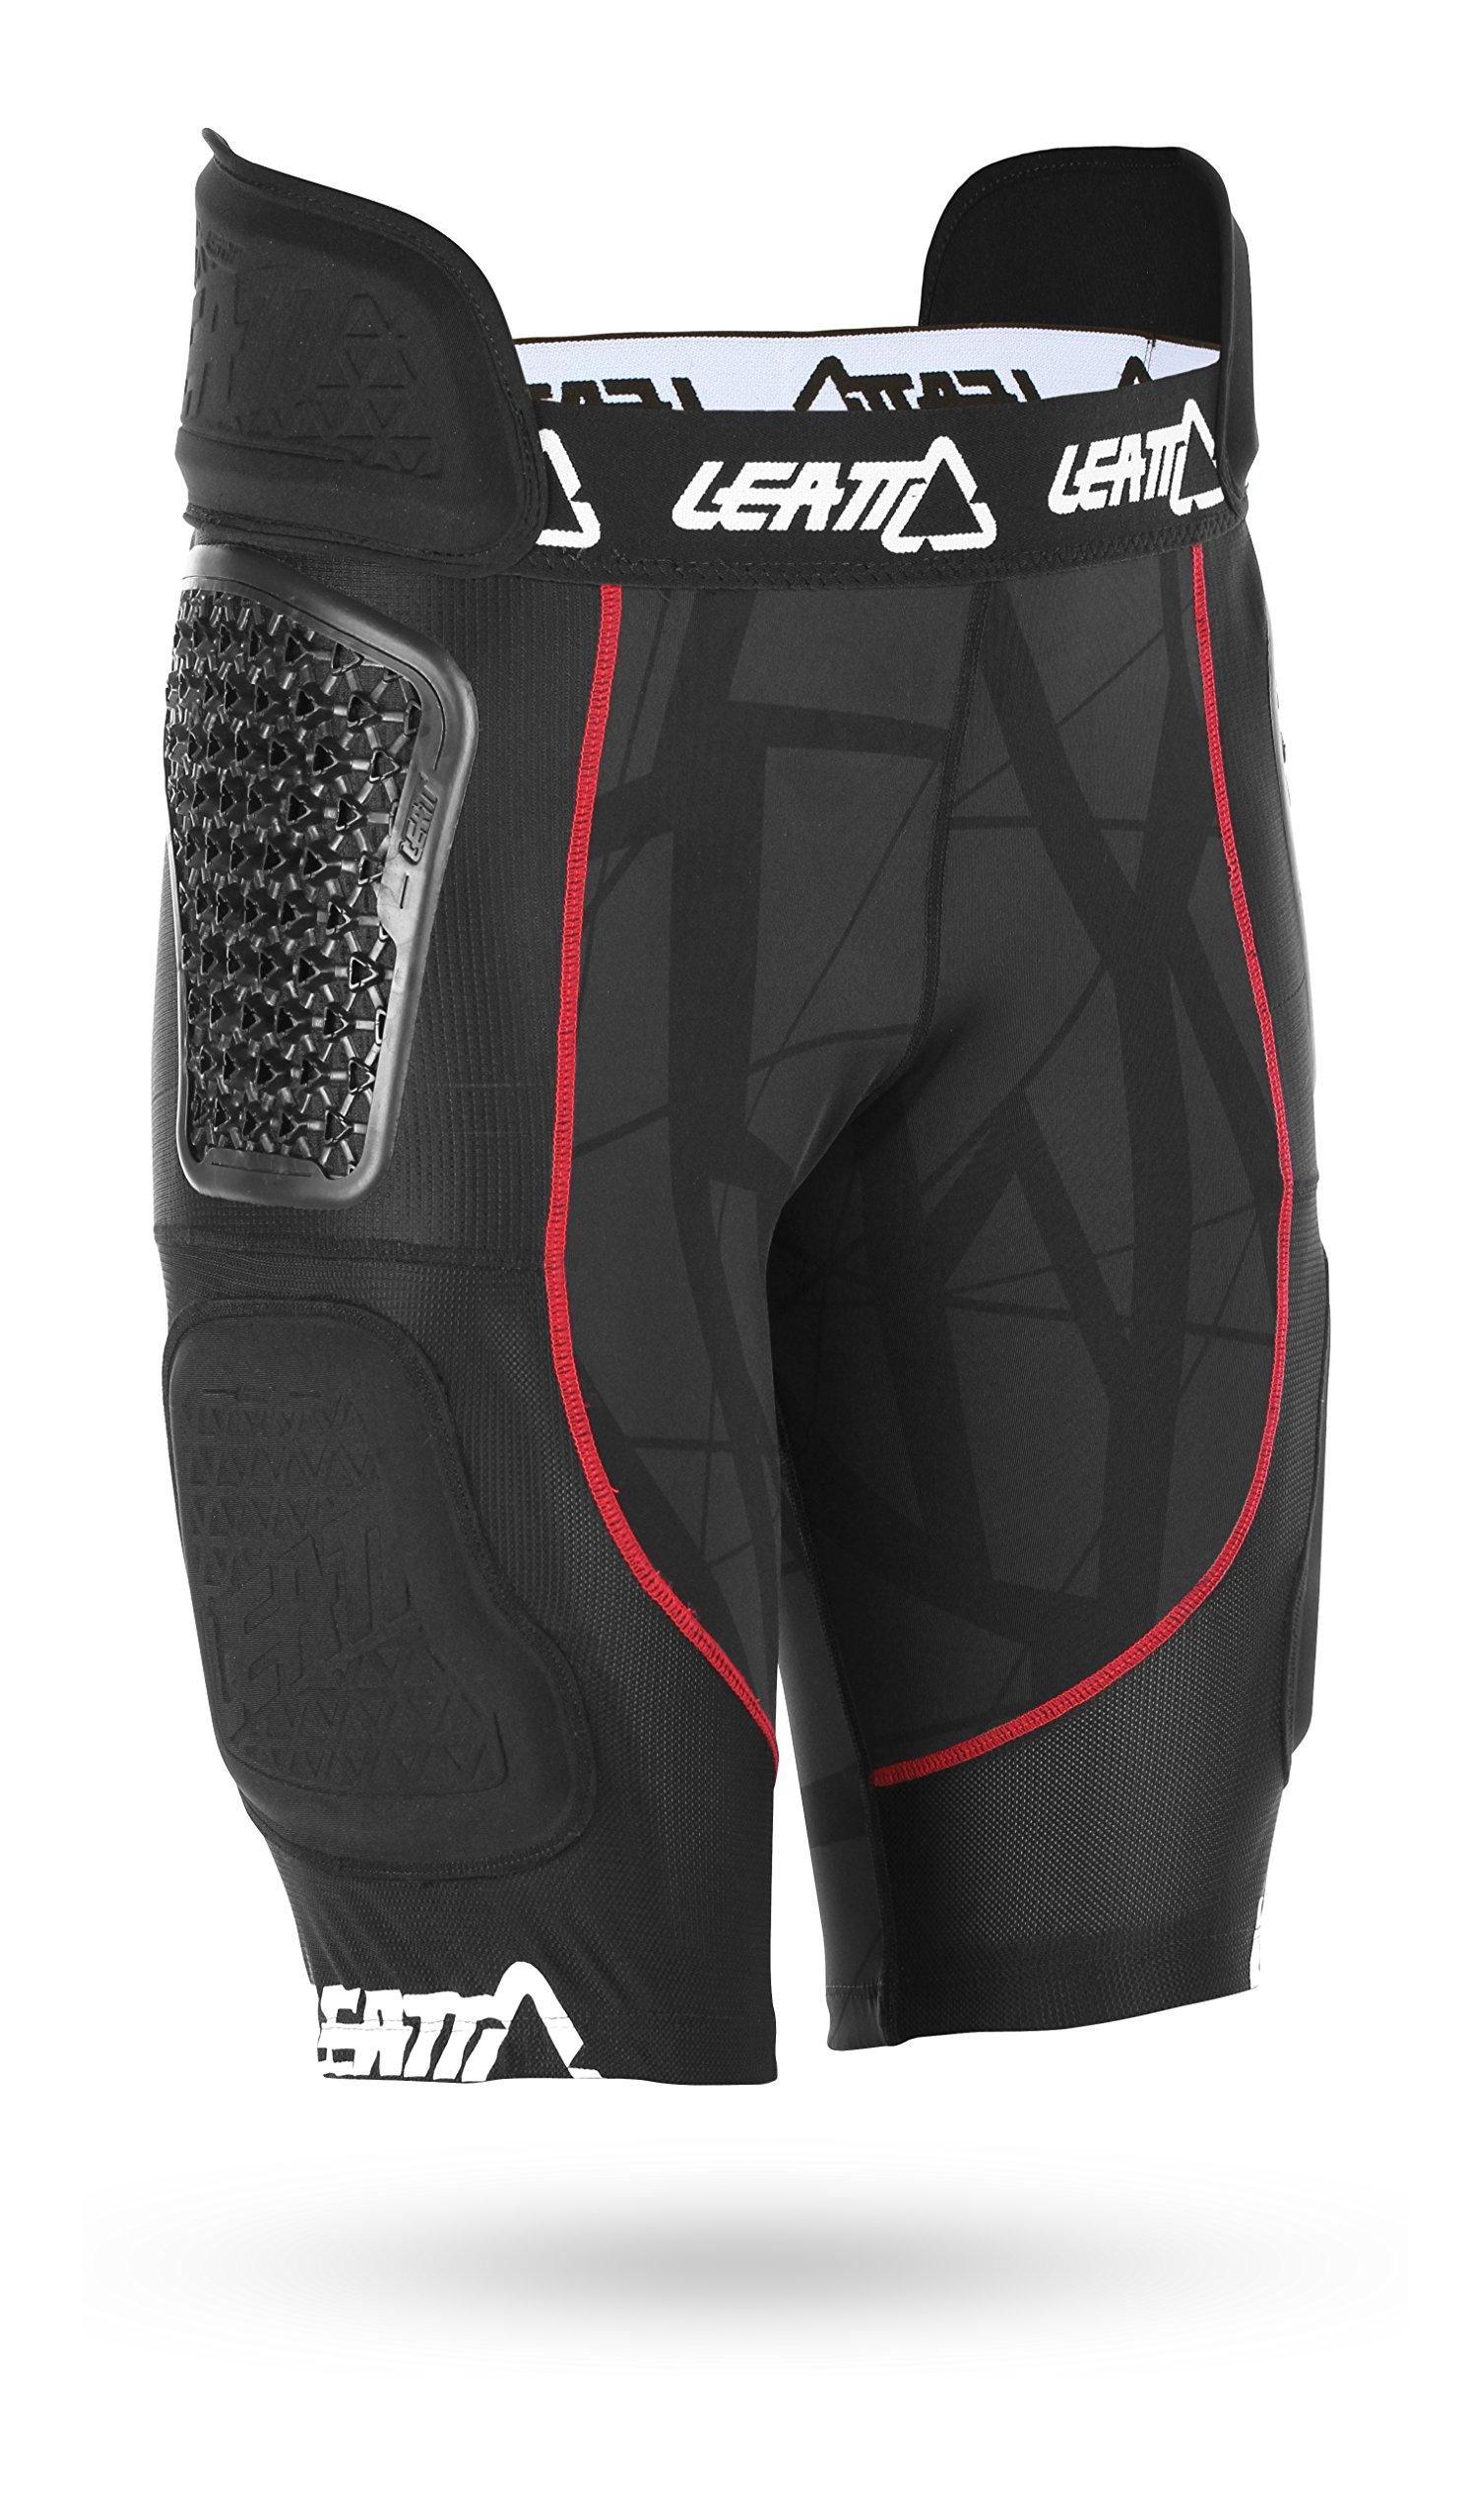 Leatt 5016000205 GPX 5.5 AirFlex Impact Shorts (Black, XX-Large) by Leatt Brace